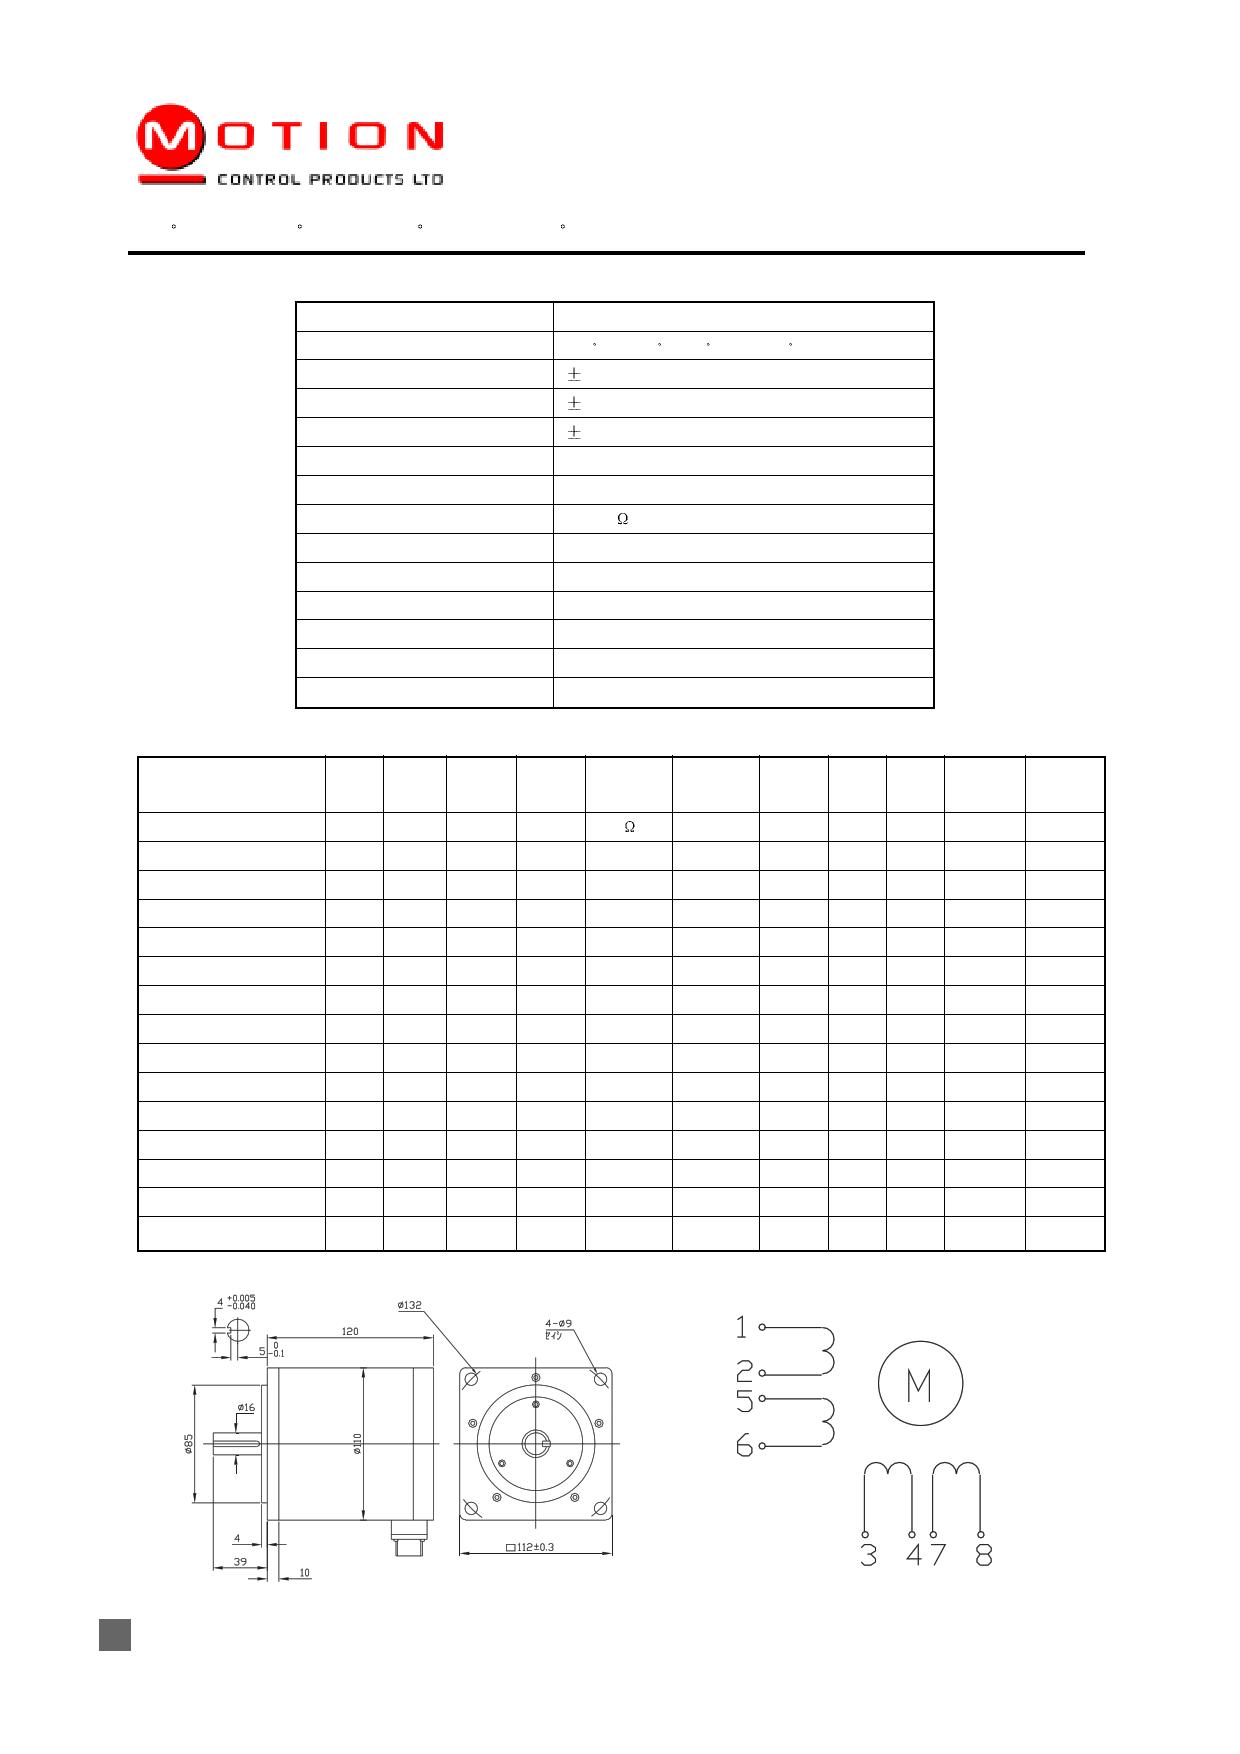 FL110ST192-30010MA Datasheet, FL110ST192-30010MA PDF,ピン配置, 機能